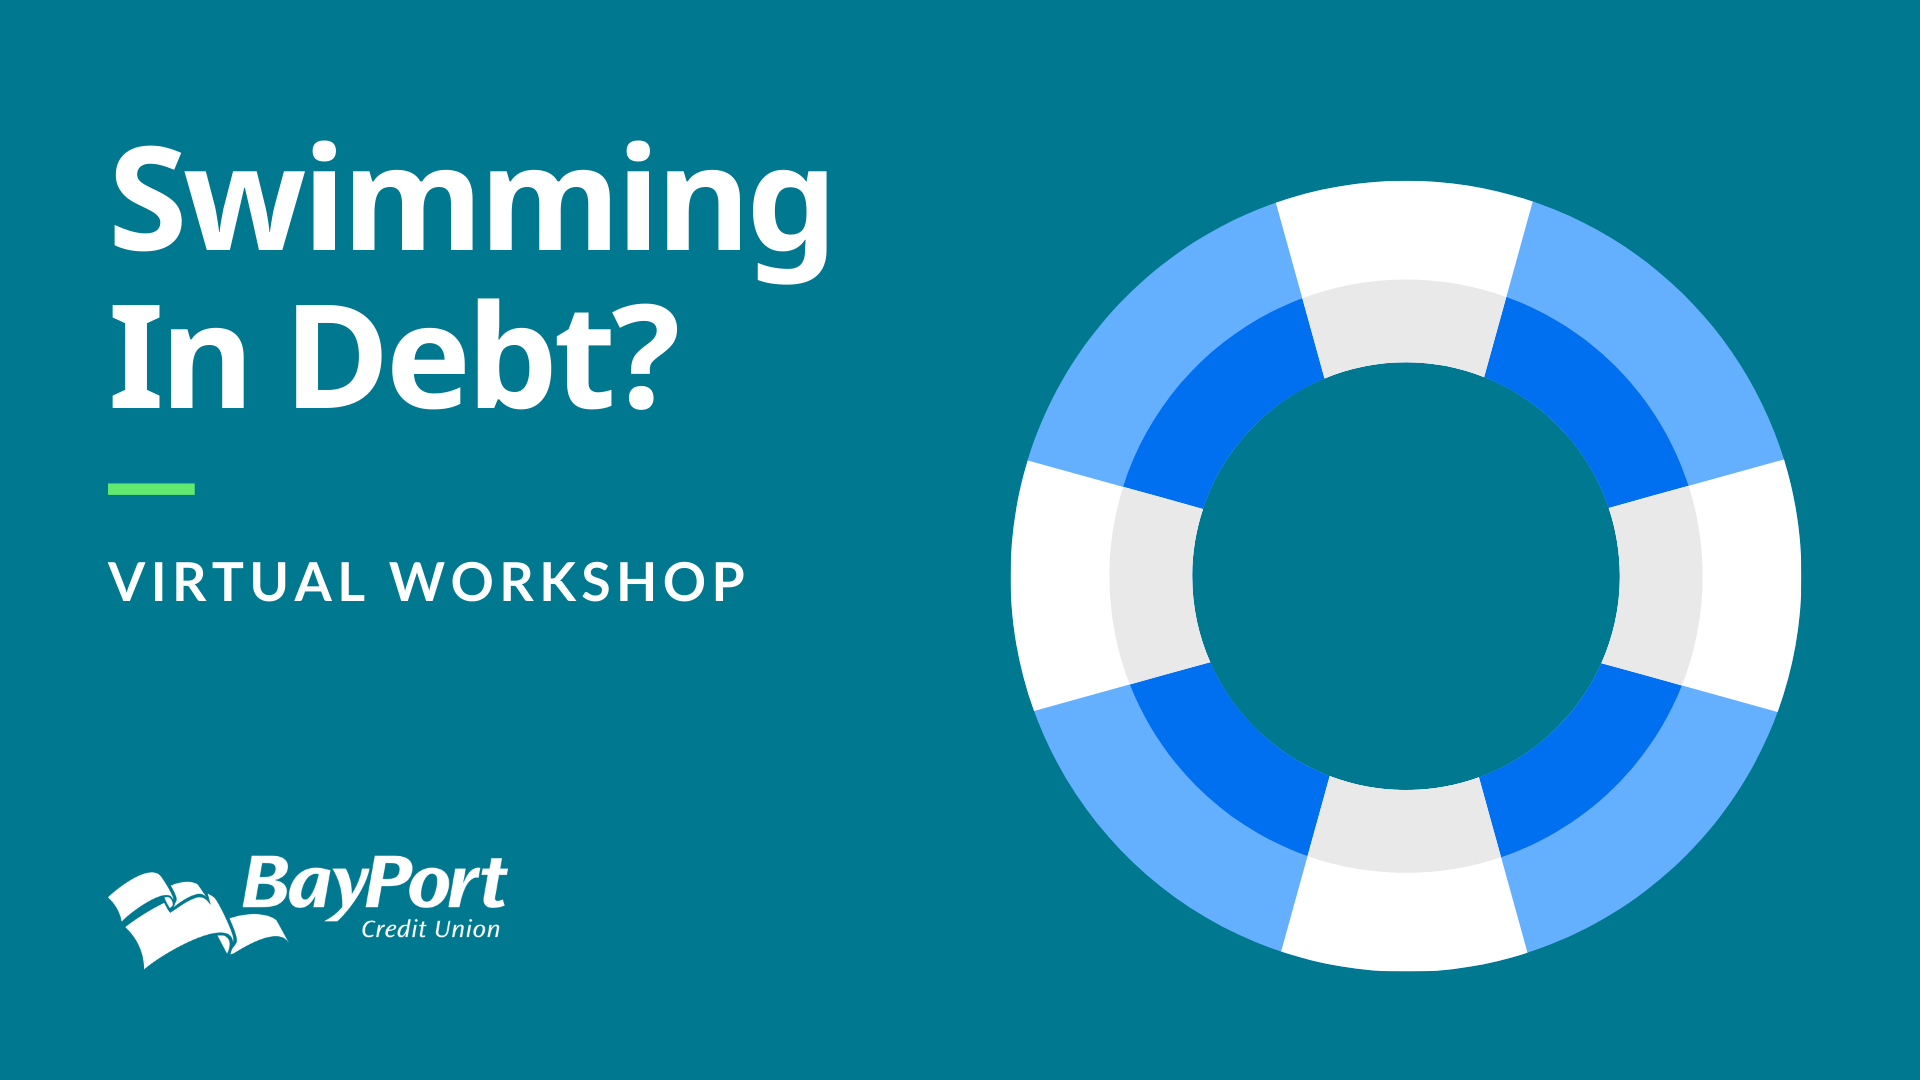 Swimming In Debt